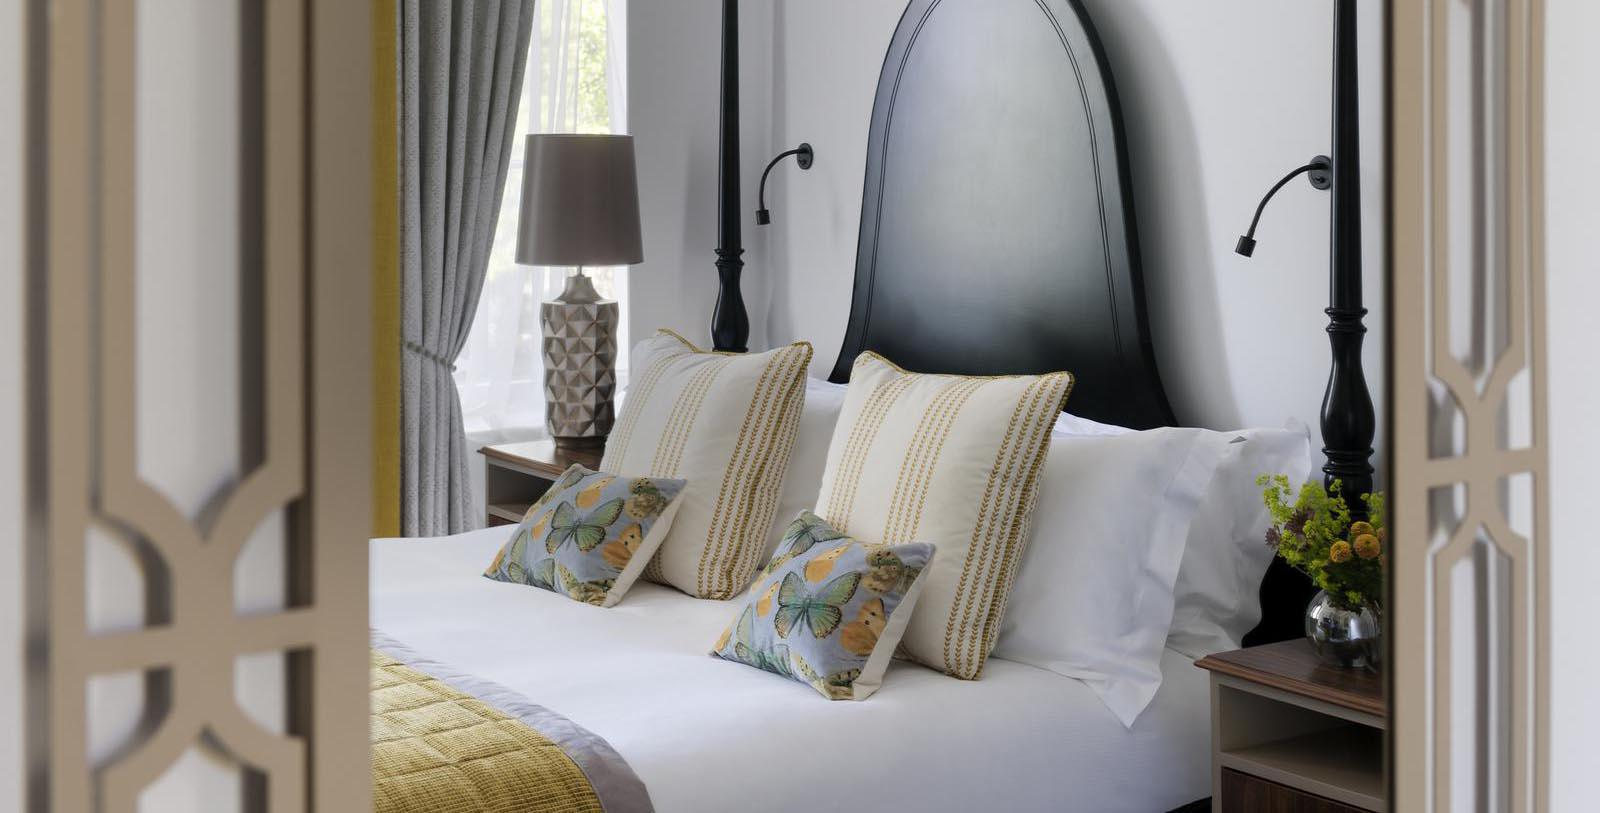 Image of Guestroom Interior Queens Hotel Cheltenham, 1838, Member of Historic Hotels Worldwide, Cheltenham, England, Location